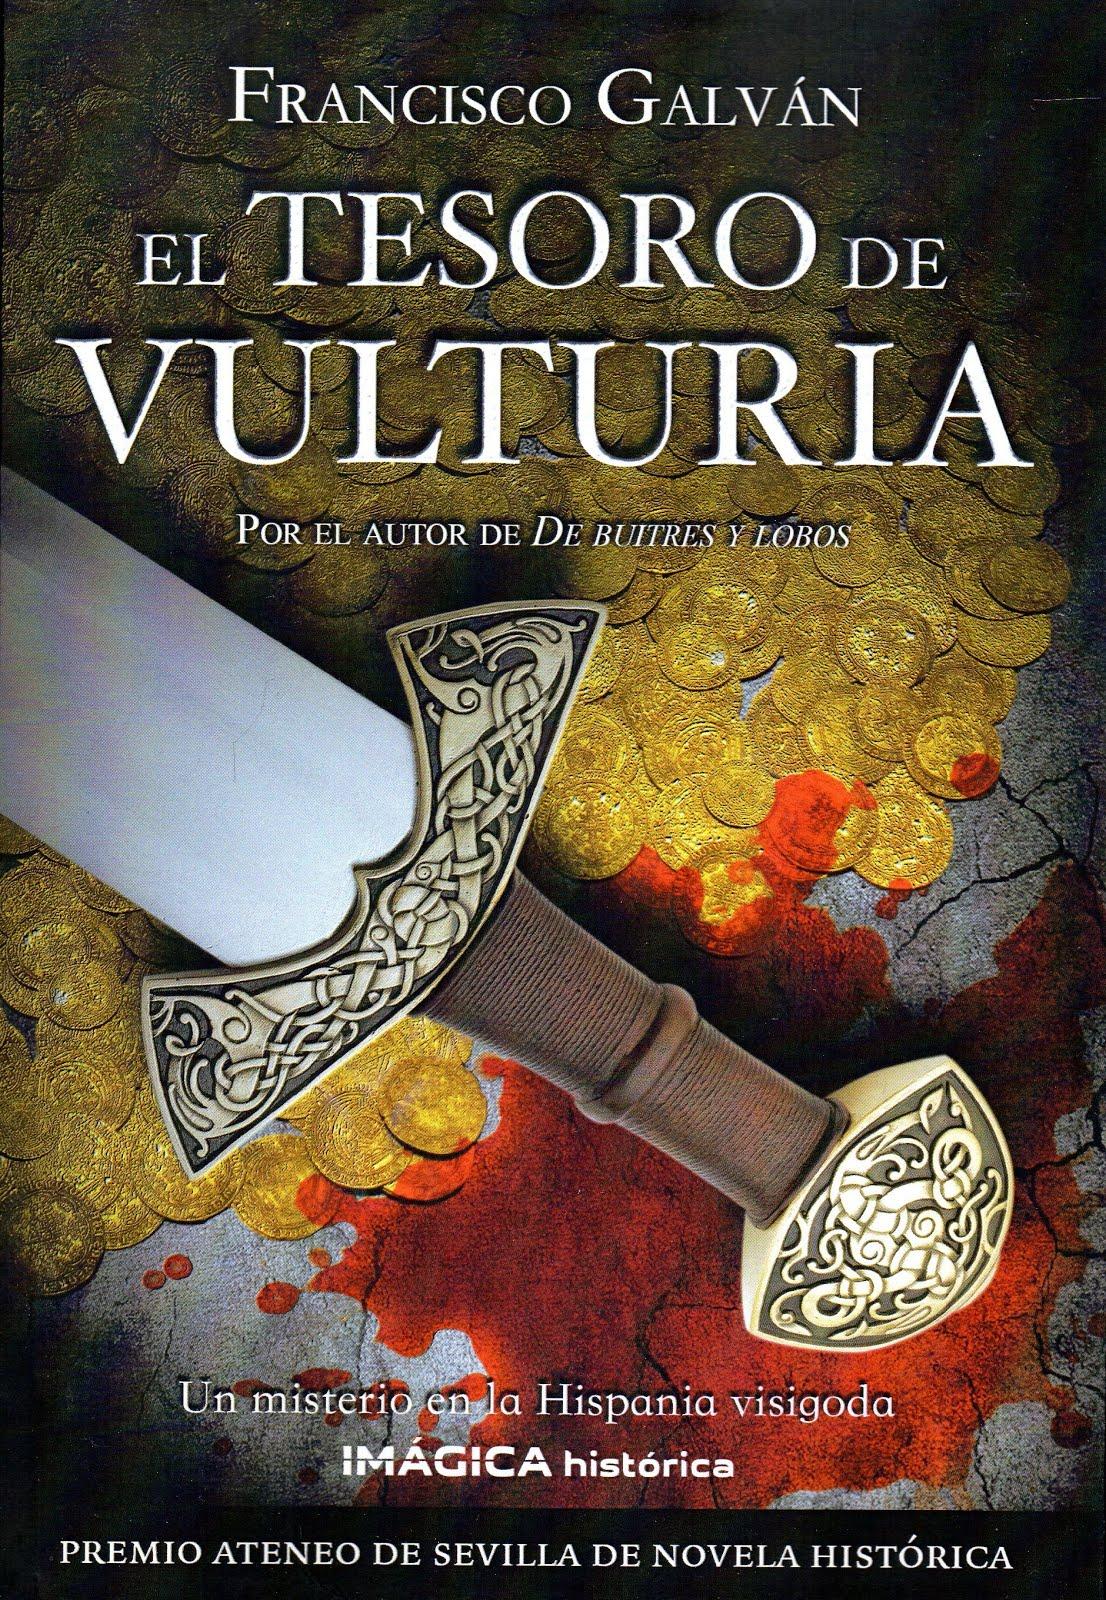 """El tesoro de Vulturia"" (2010) Premio Ateneo de Sevilla de novela histórica"